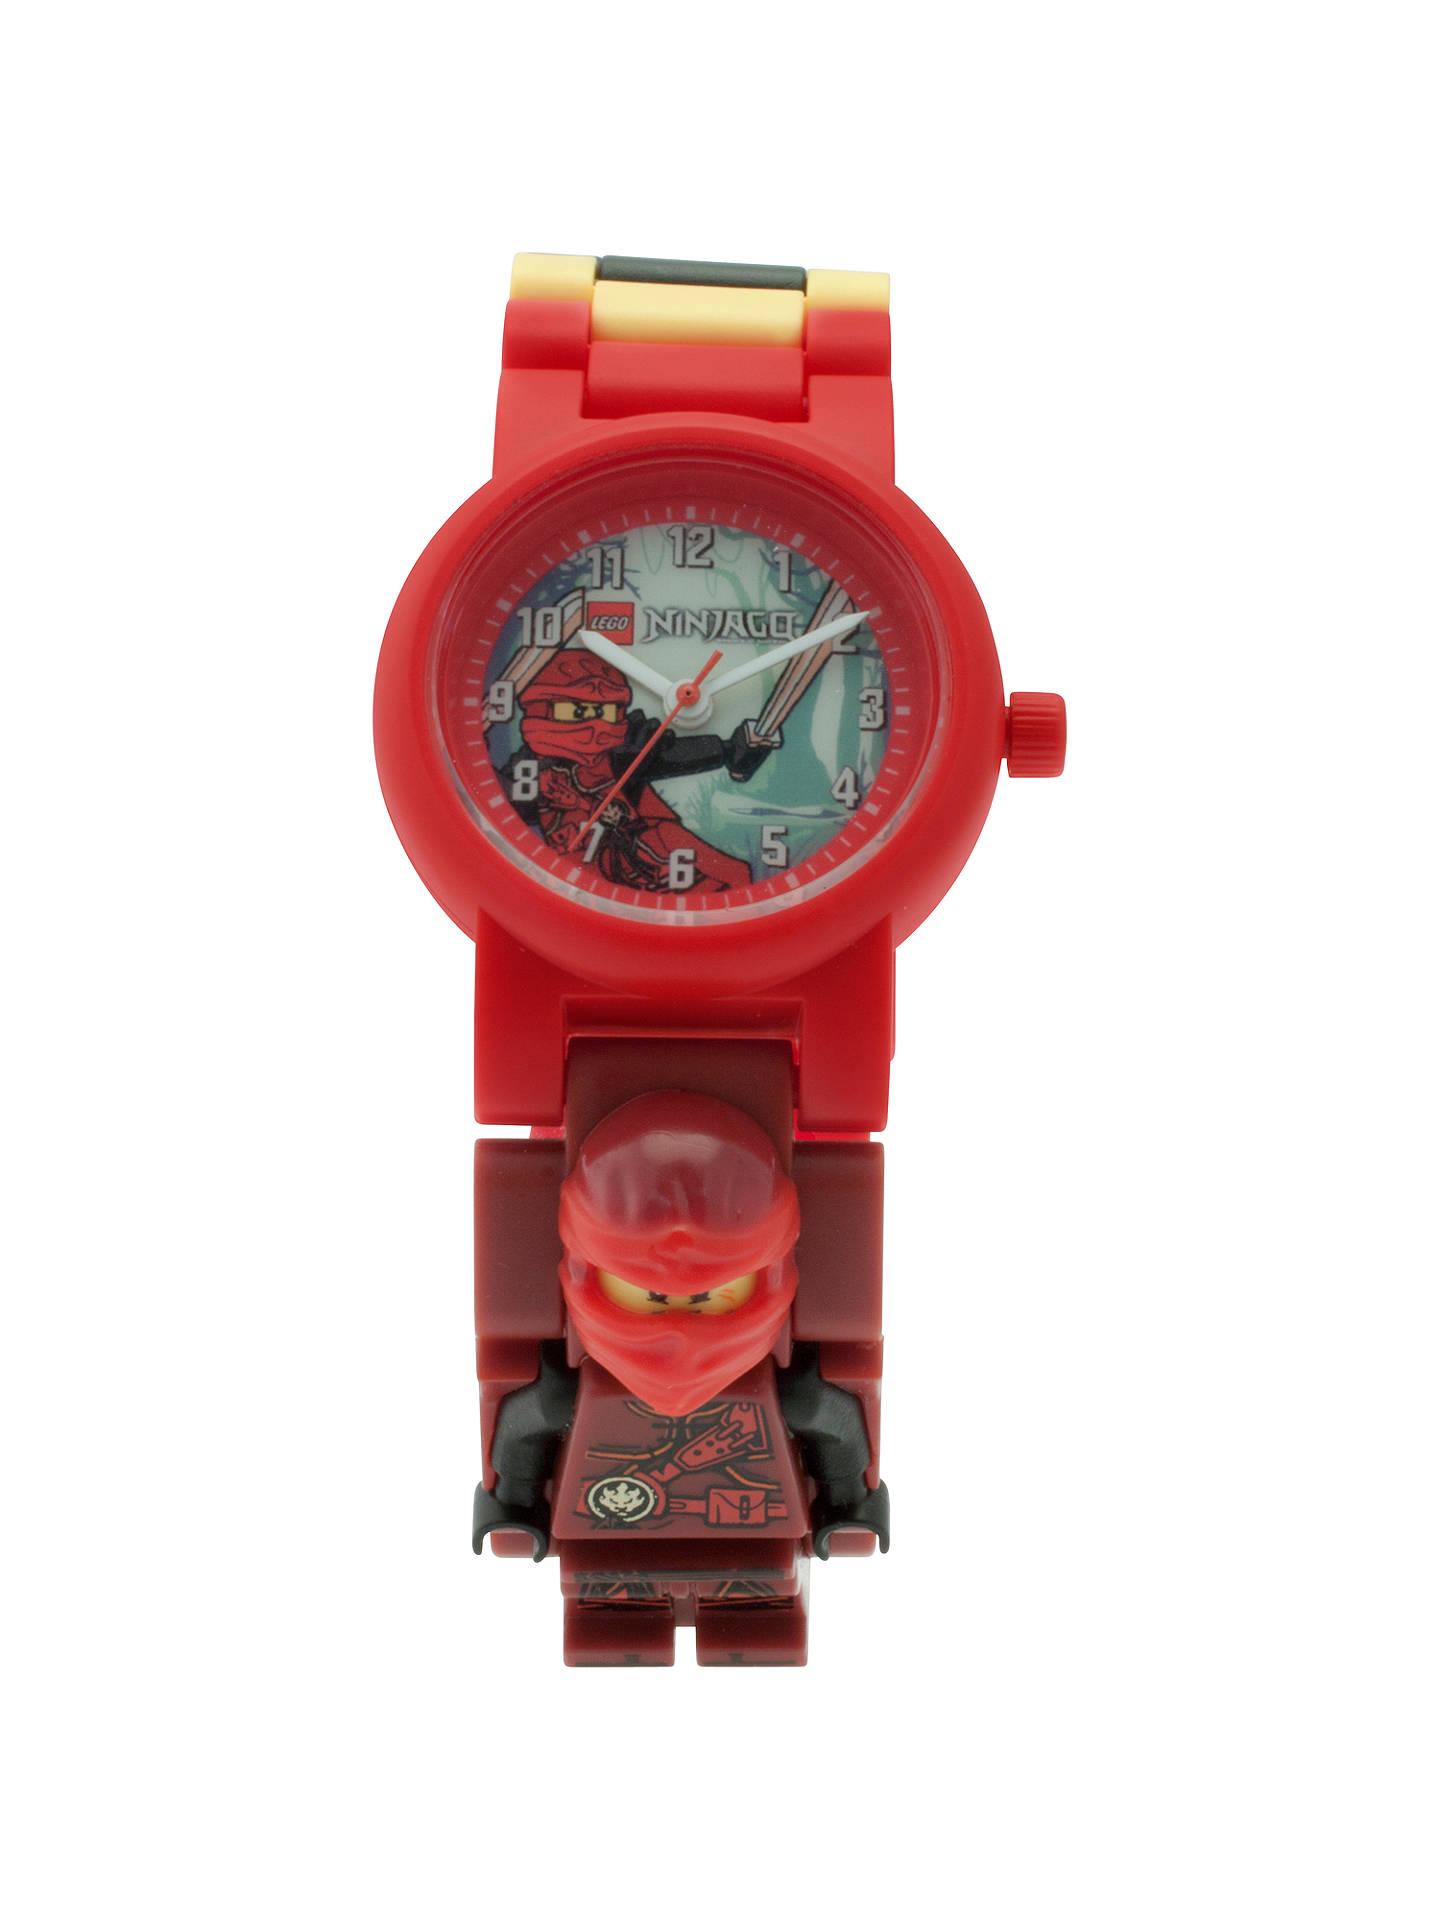 LEGO Ninjago 8020899 Kai Minifigure Buildable Watch at ...